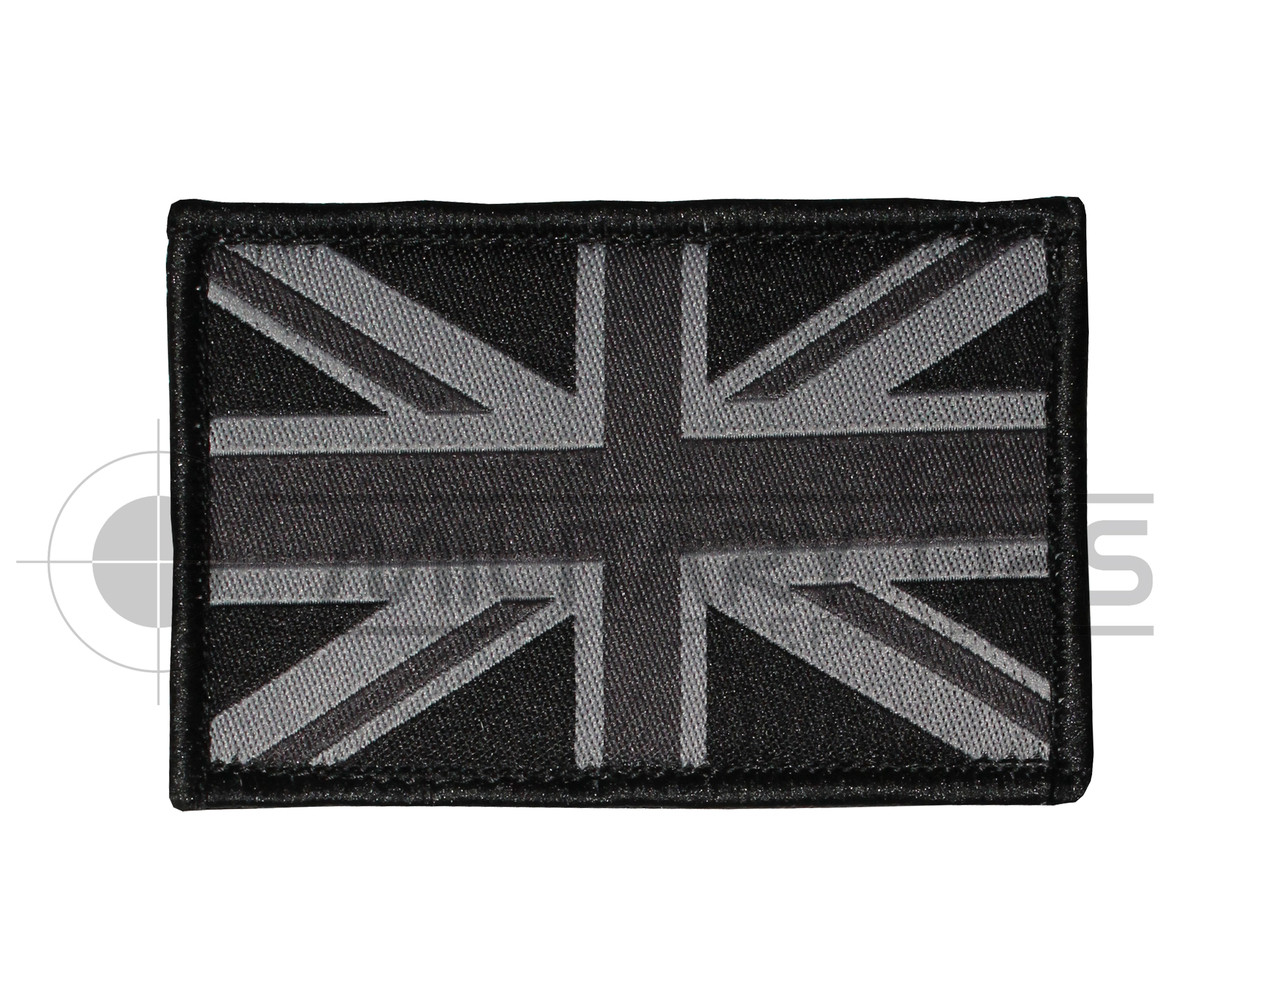 Union flag jack velcro patch black subdued militaryops ltd